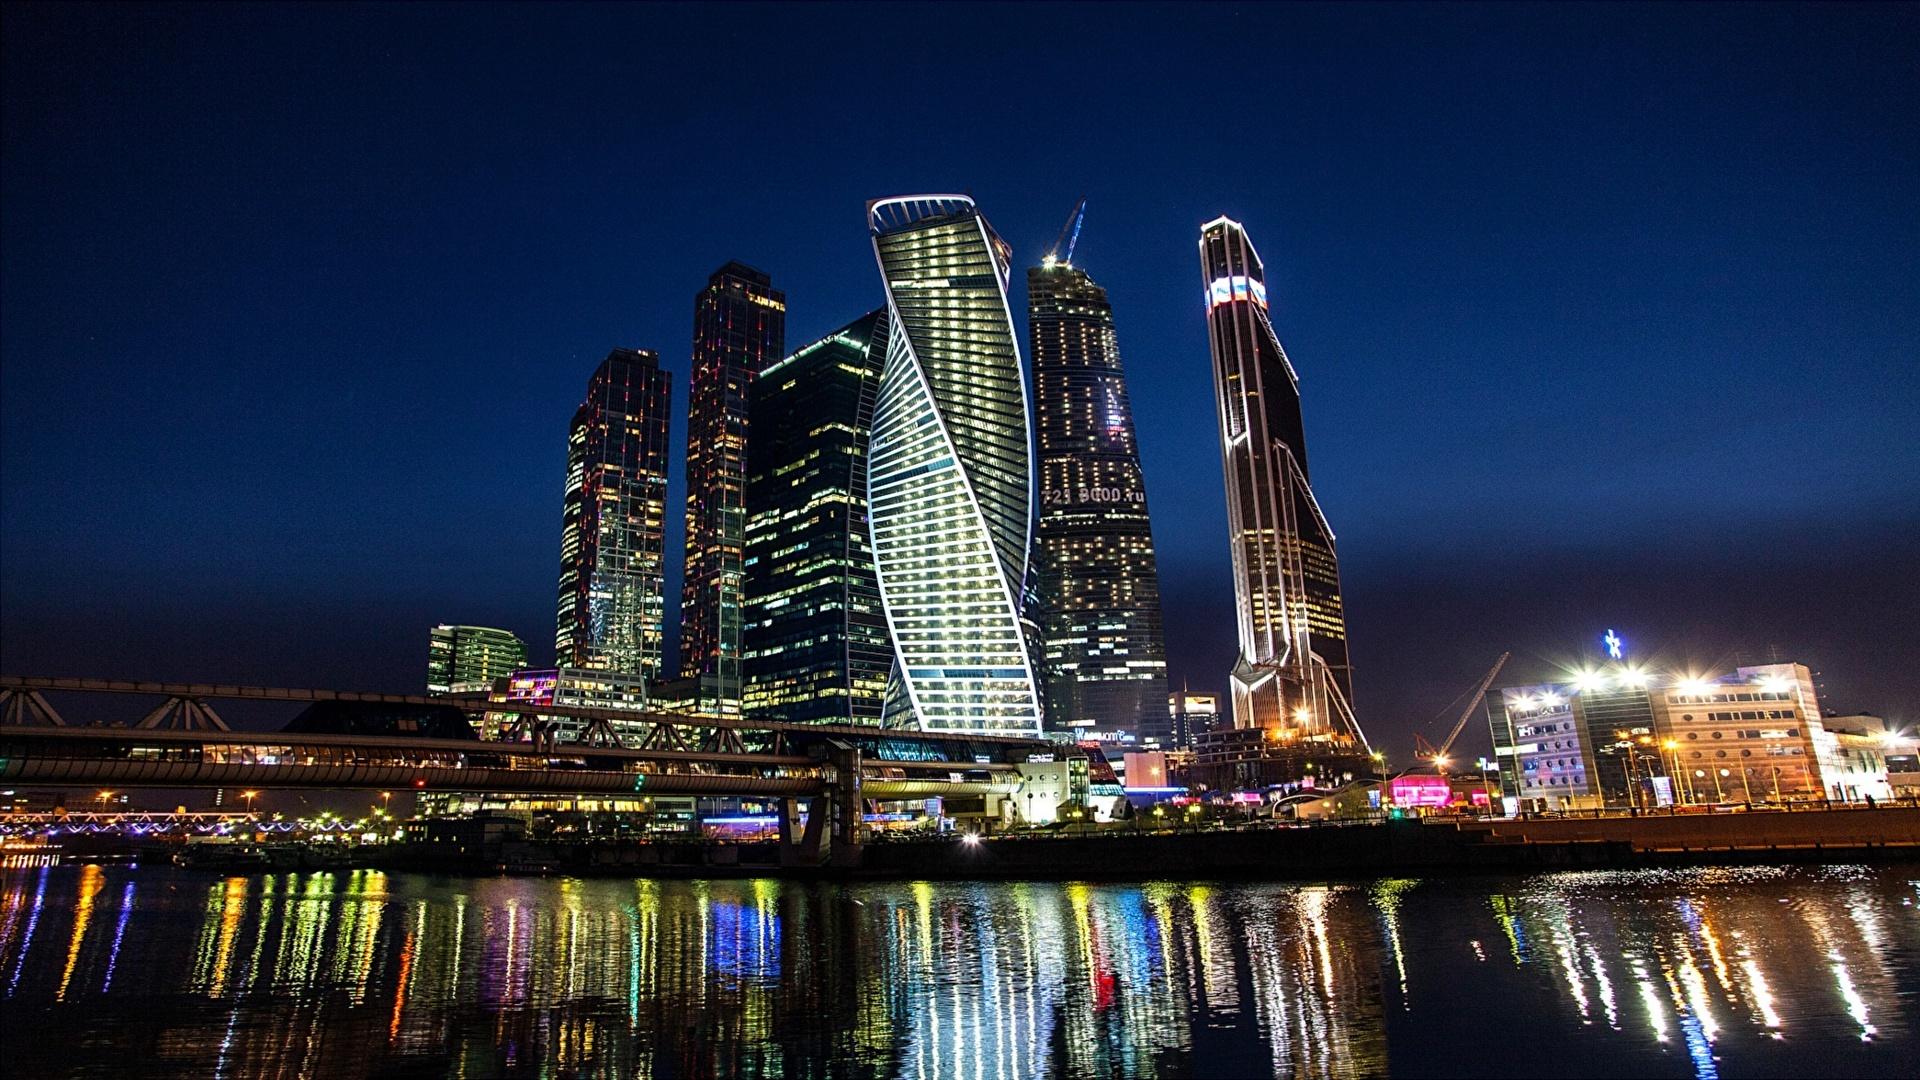 Официальная страница Бориса Гребенщикова